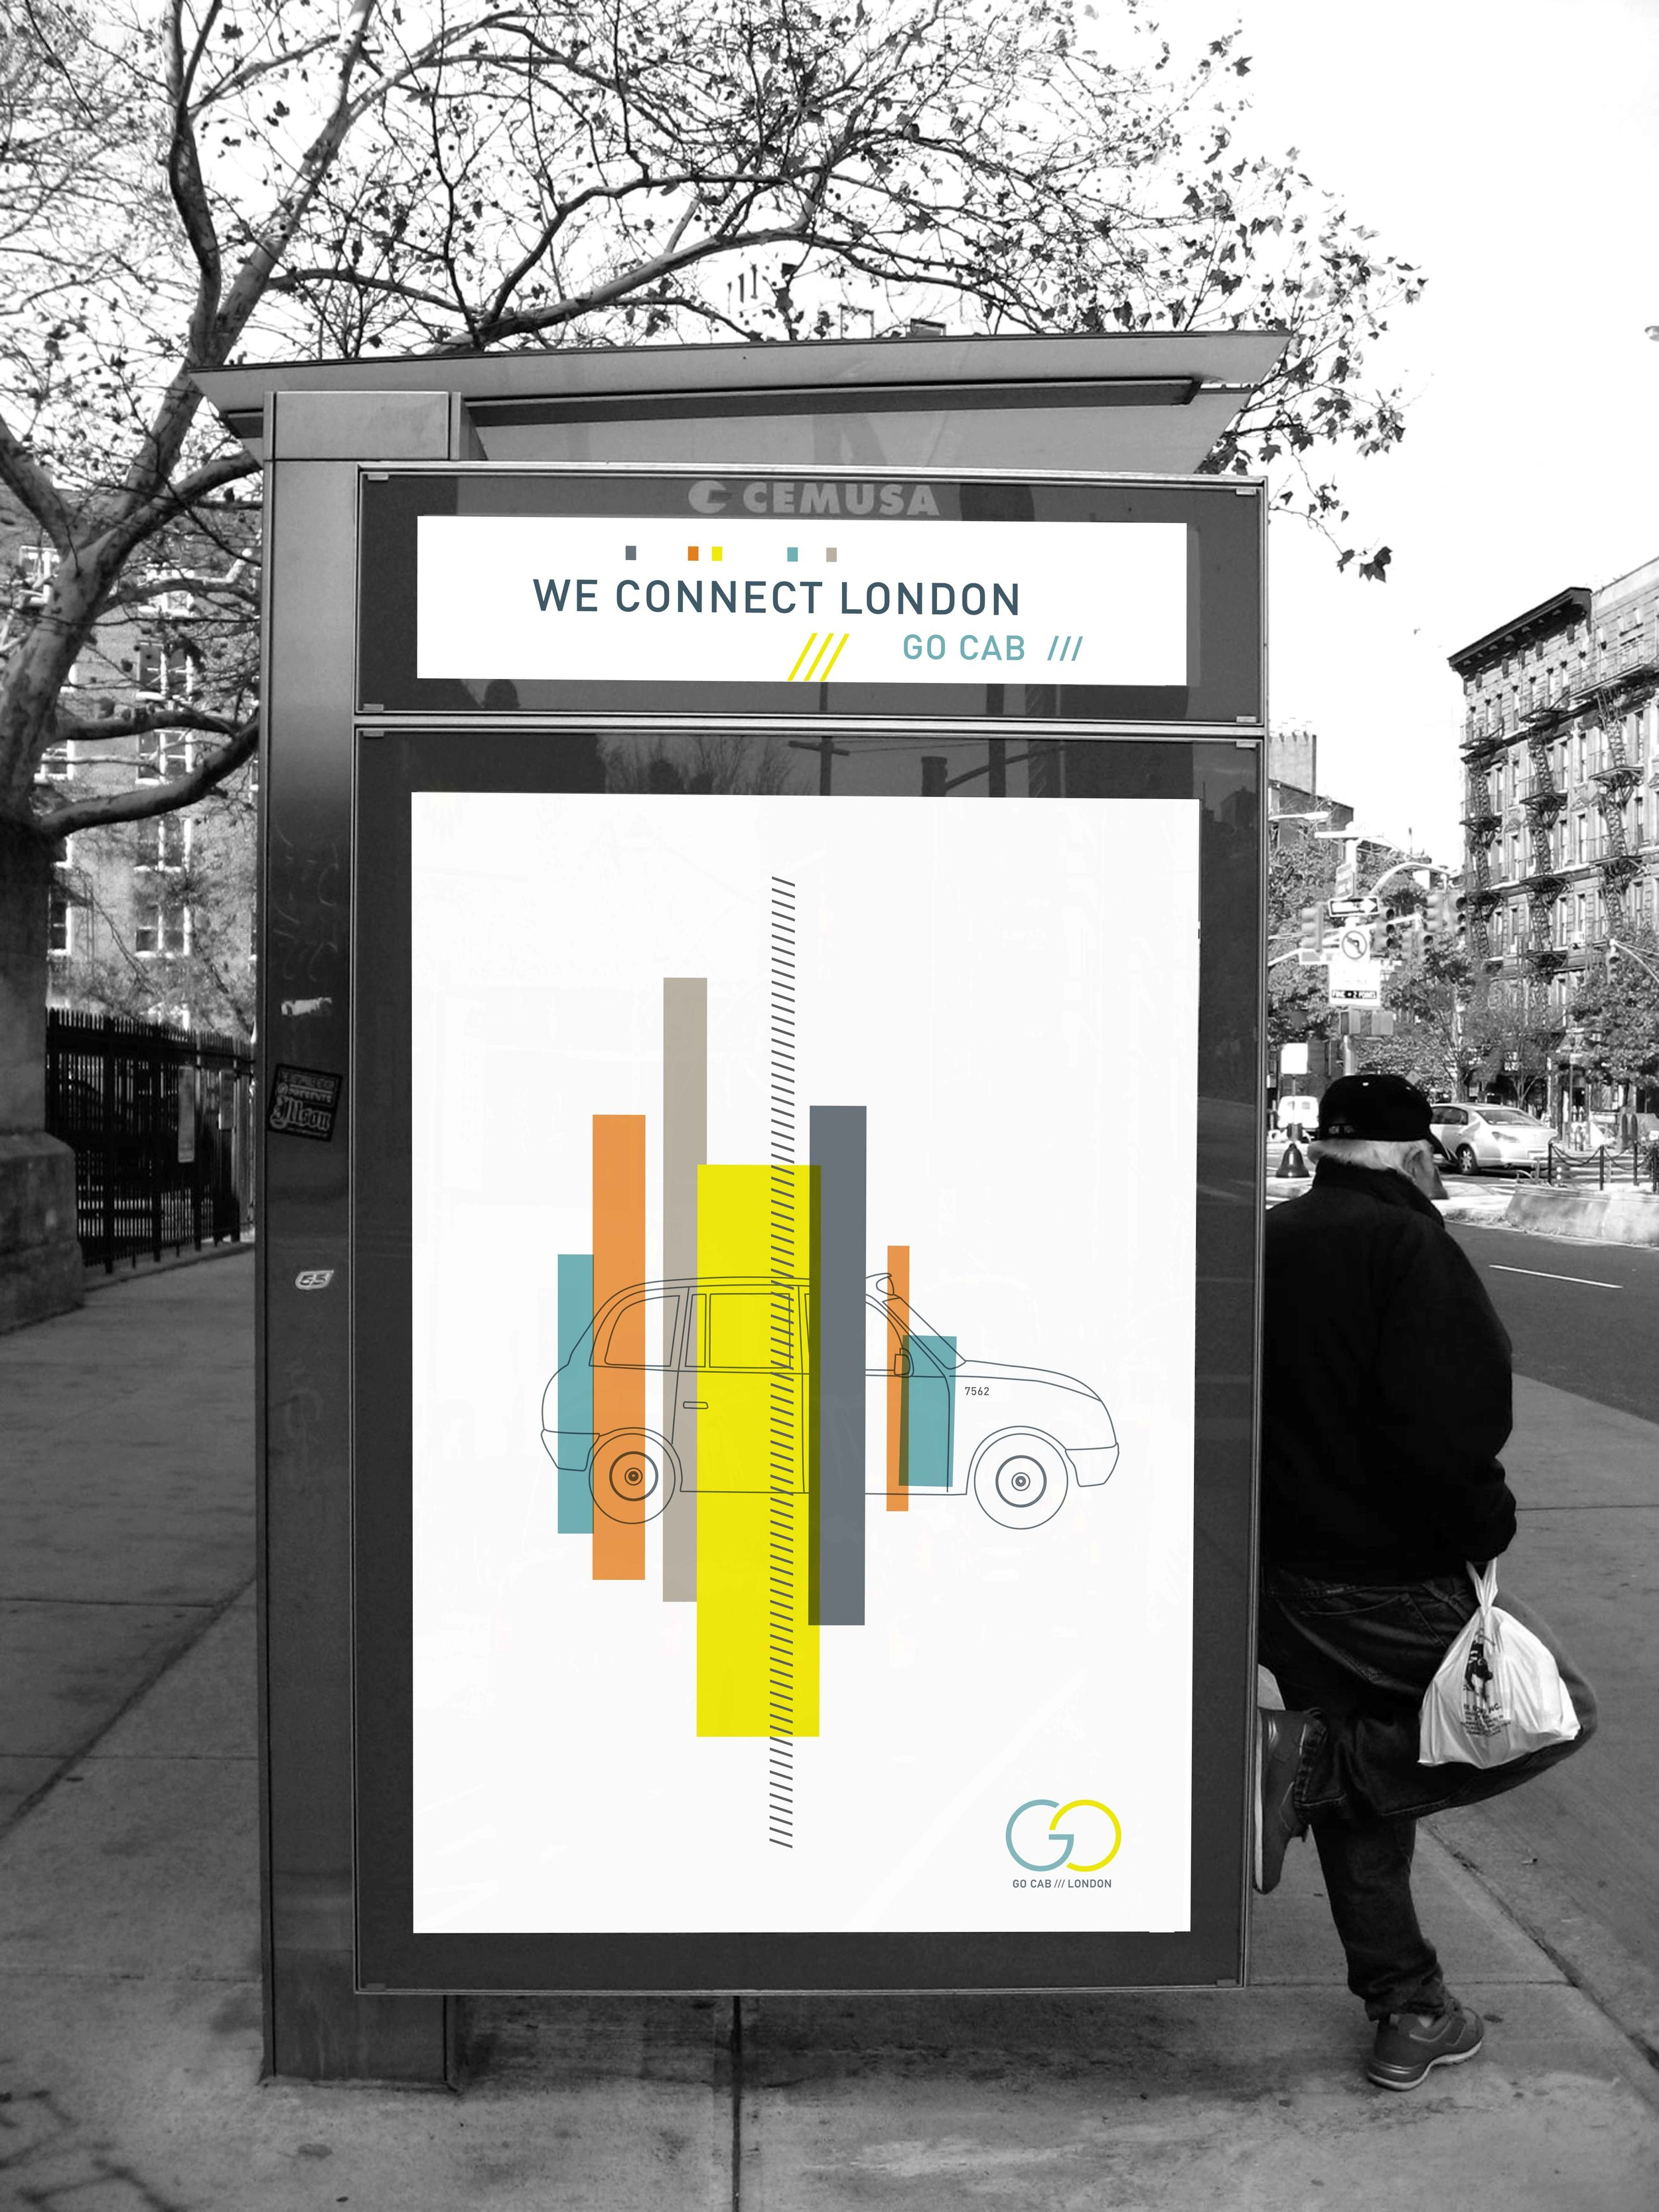 London Cab Bus Shelter Campaign